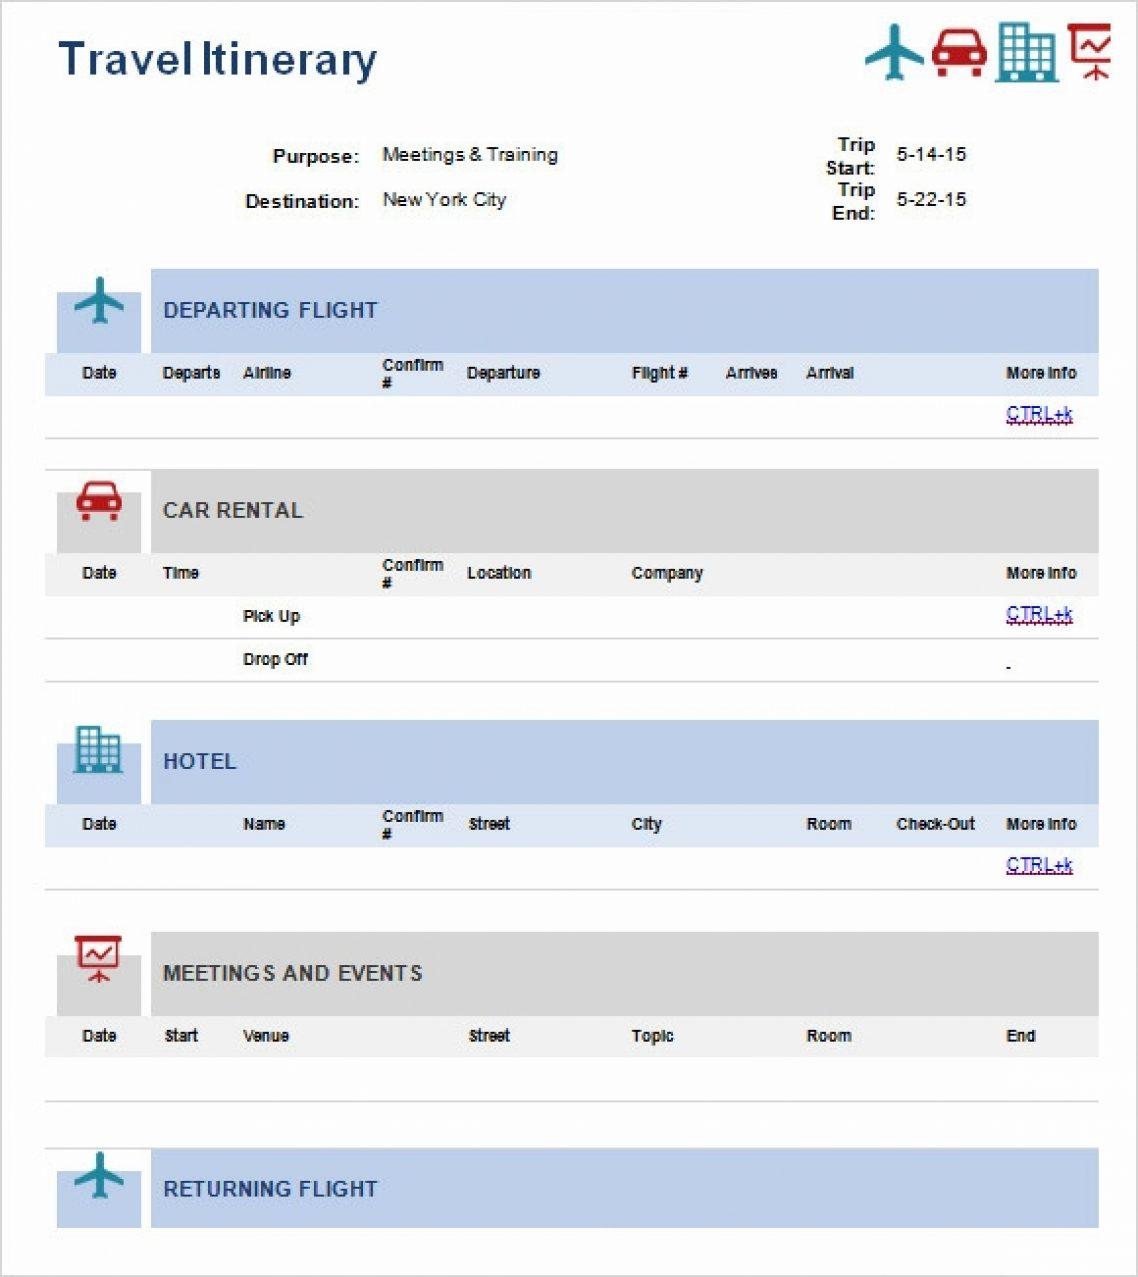 Travel Itinerary Spreadsheet Within Travel